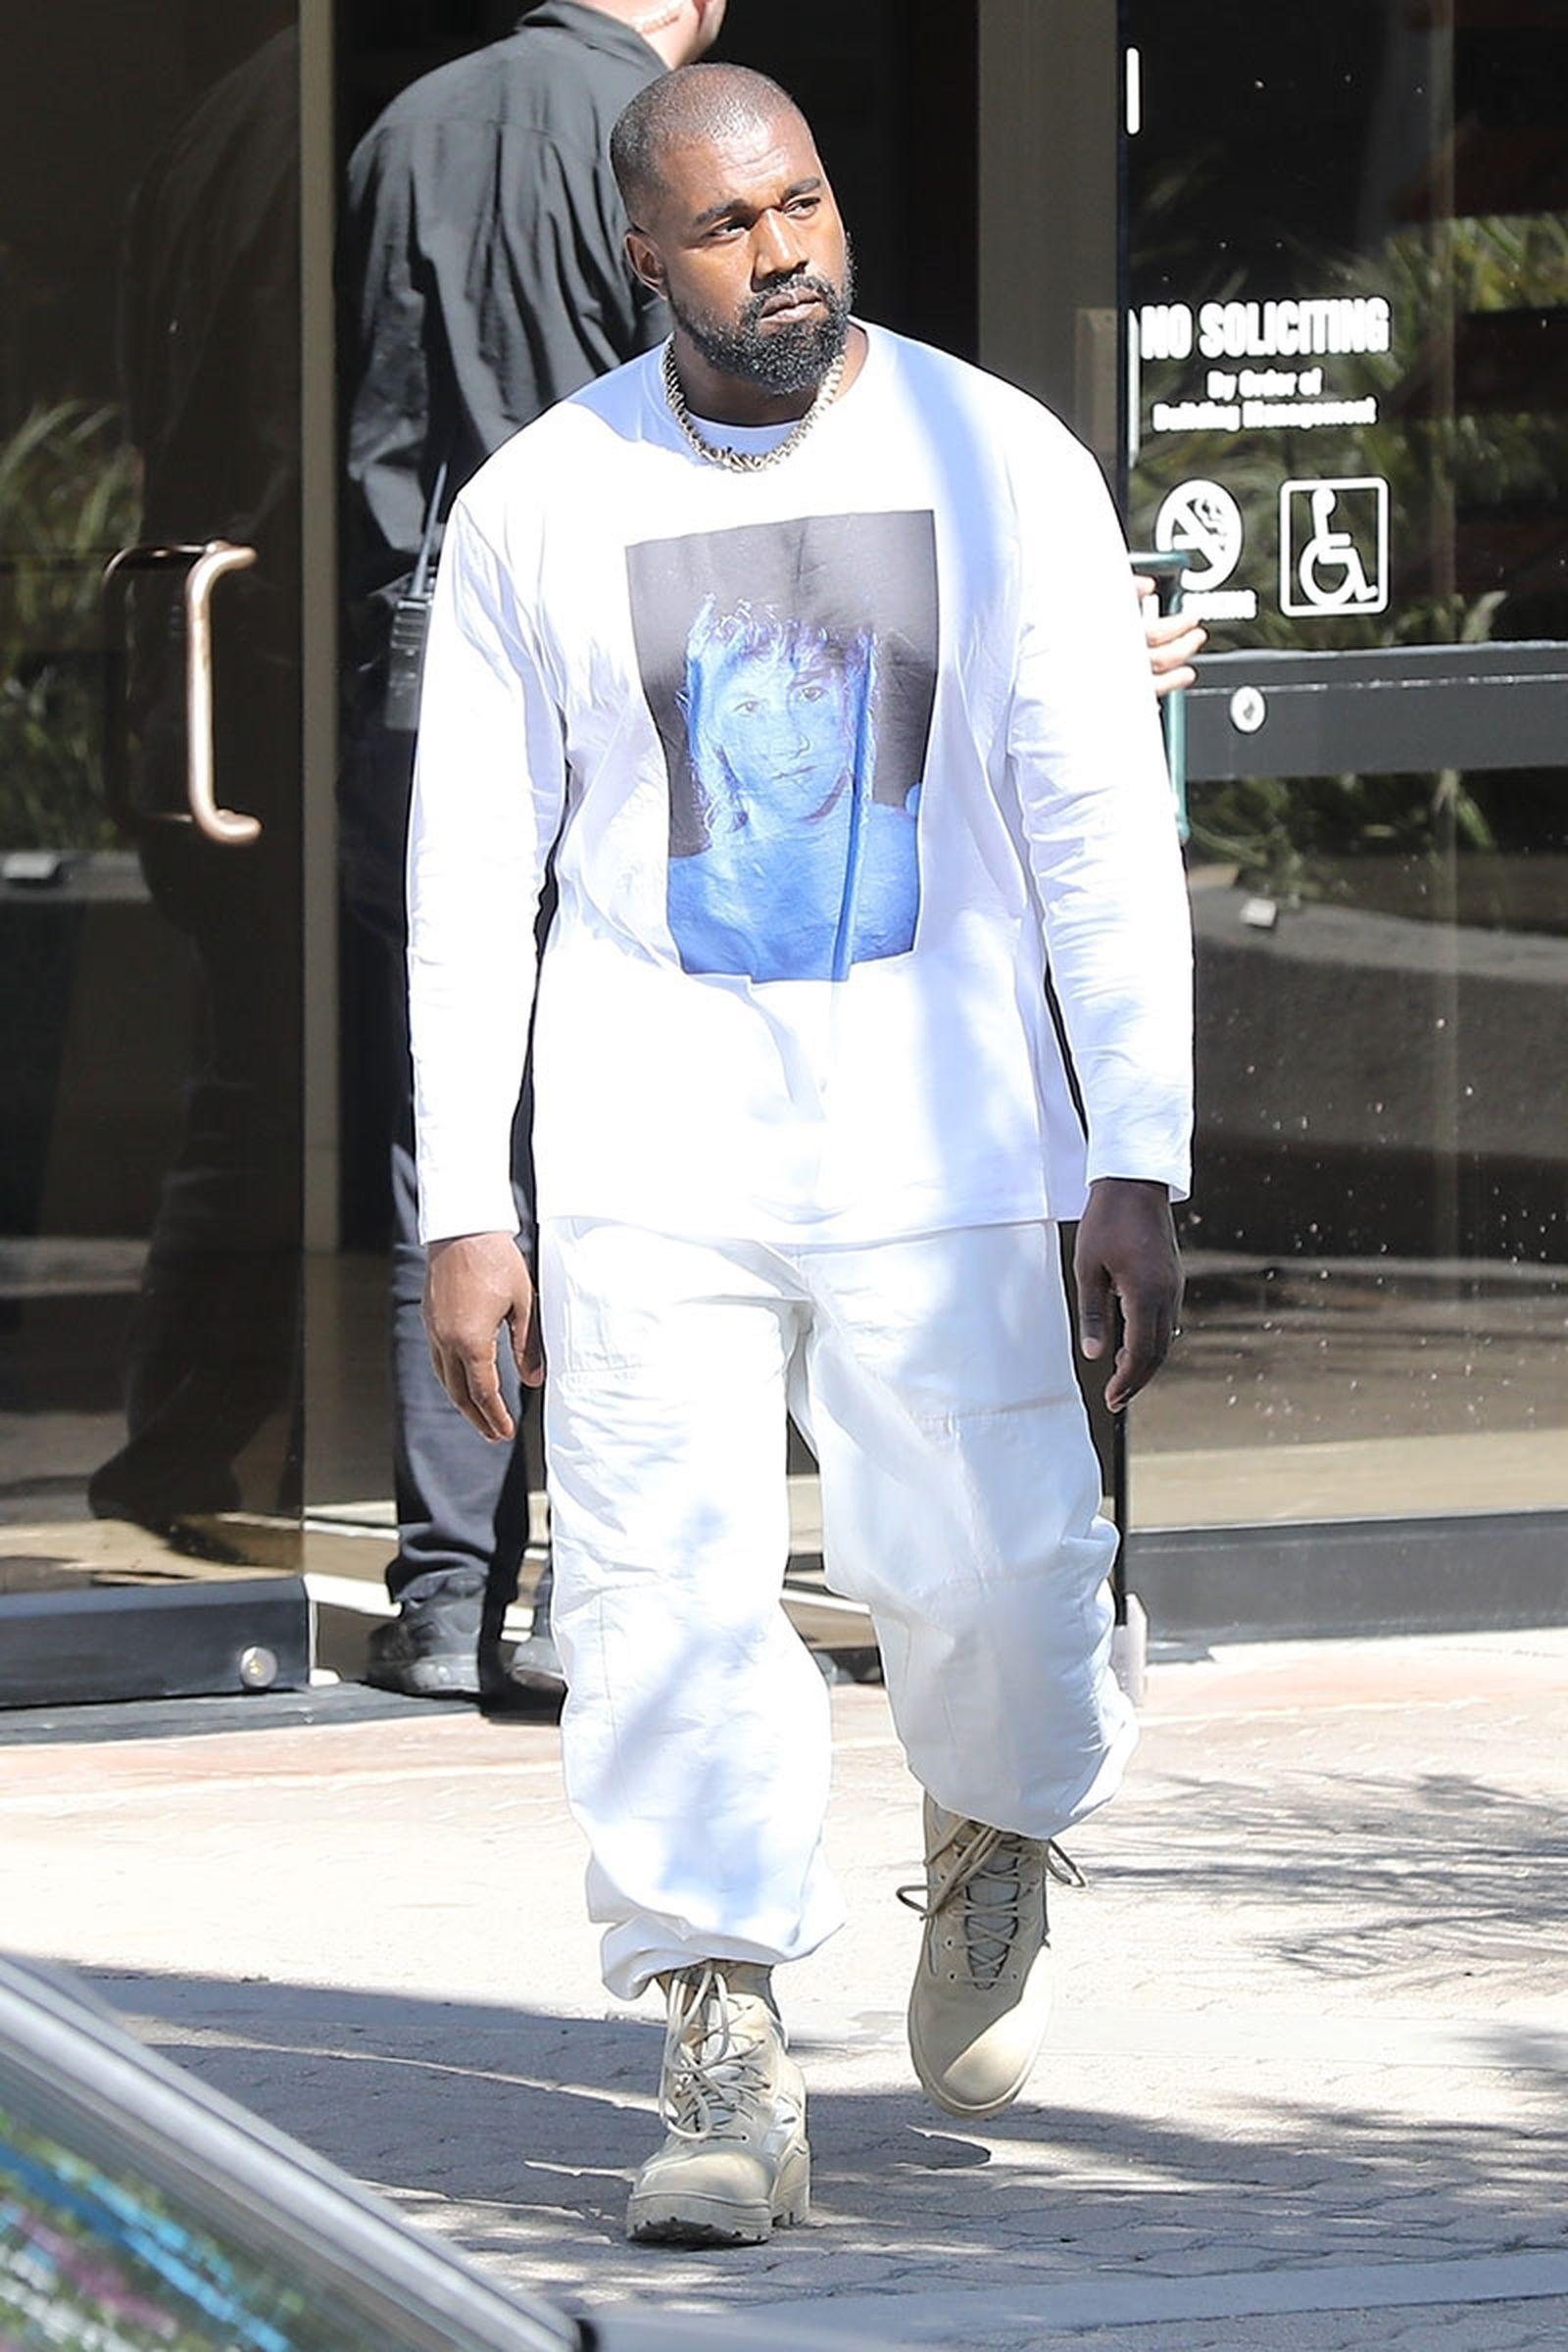 kanye west blue velvet A$AP Rocky Apple Card Chance the Rapper